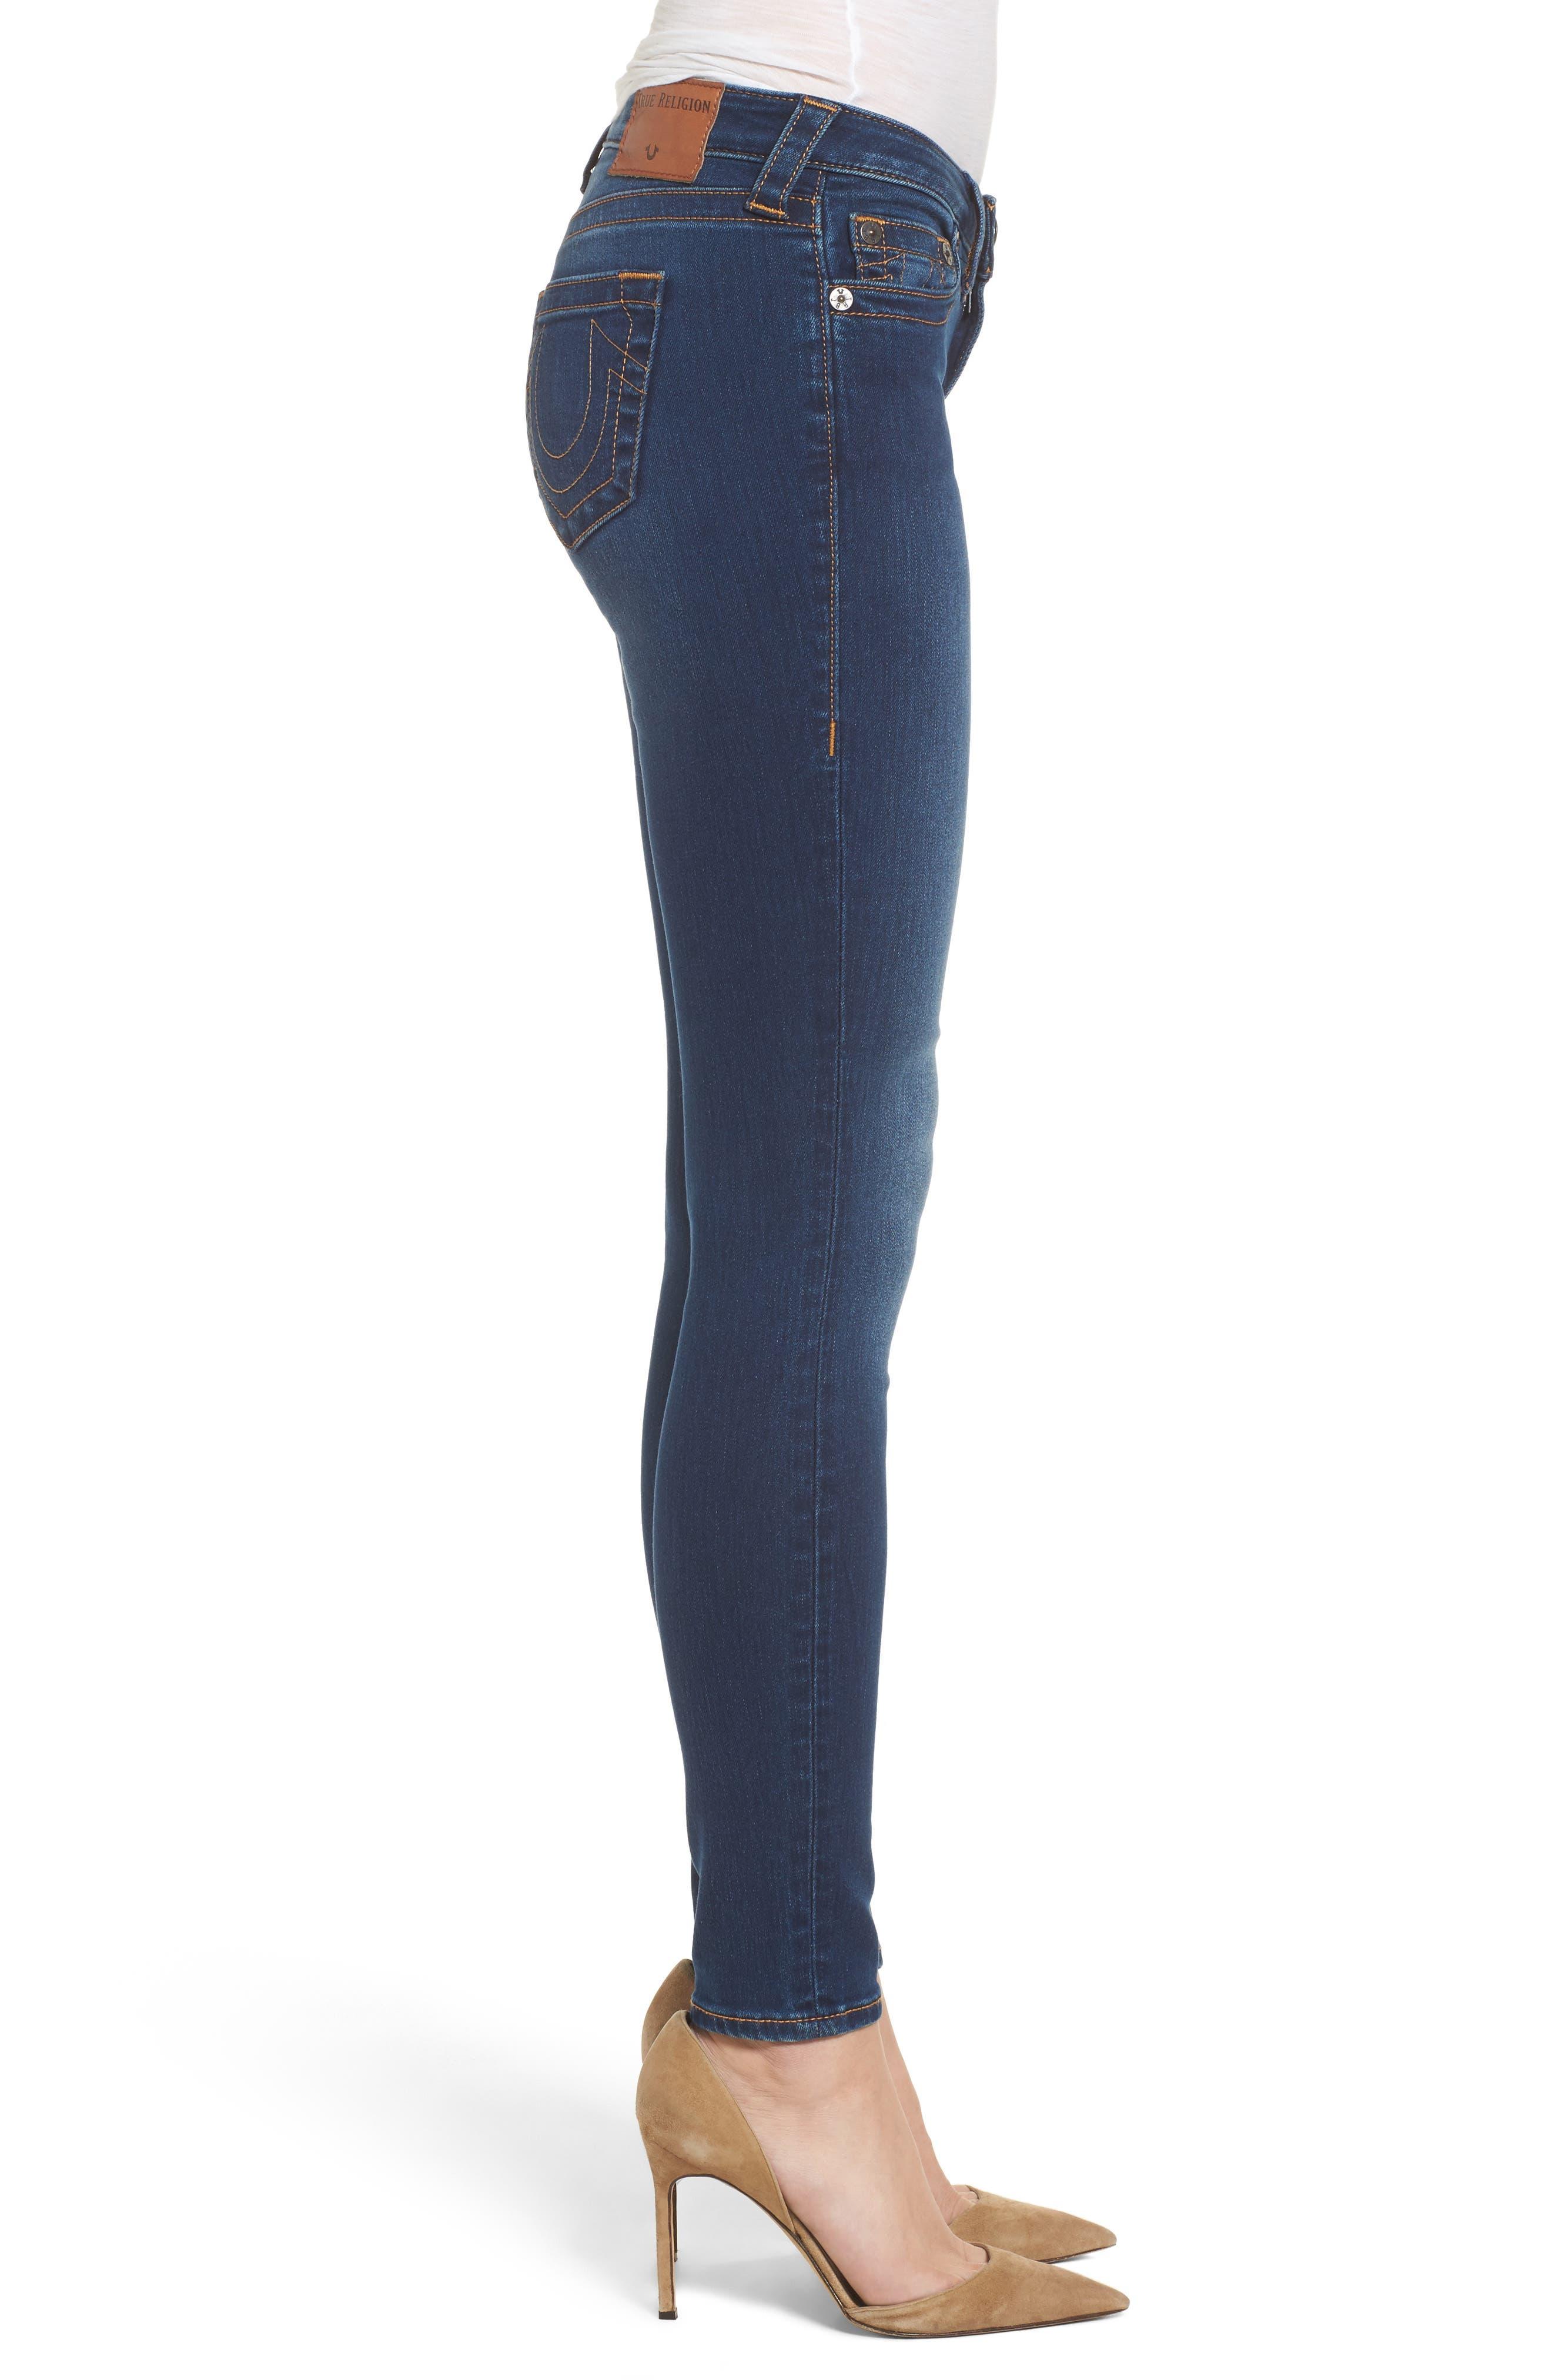 TRUE RELIGION BRAND JEANS,                             Halle Mid Rise Skinny Jeans,                             Alternate thumbnail 3, color,                             400